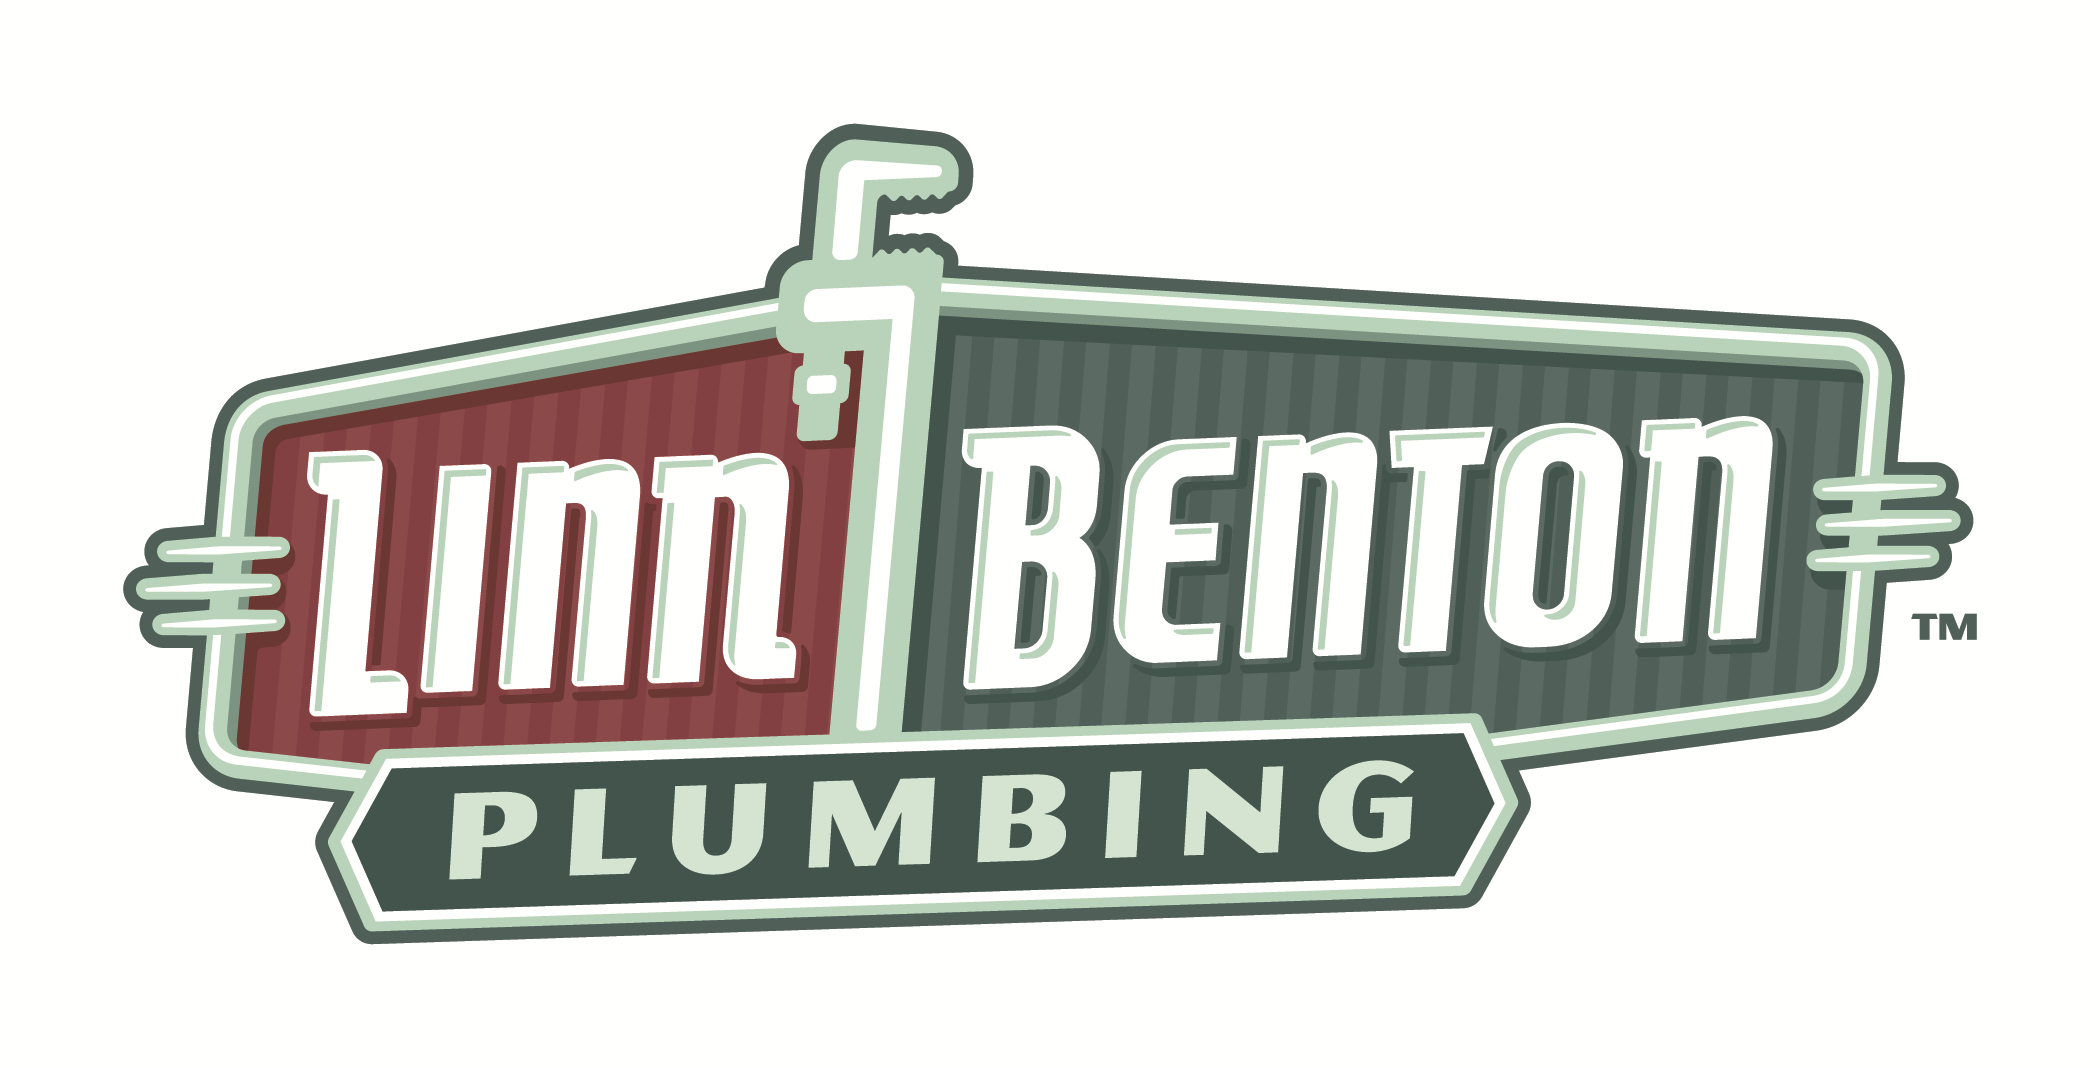 Linn Benton Plumbing